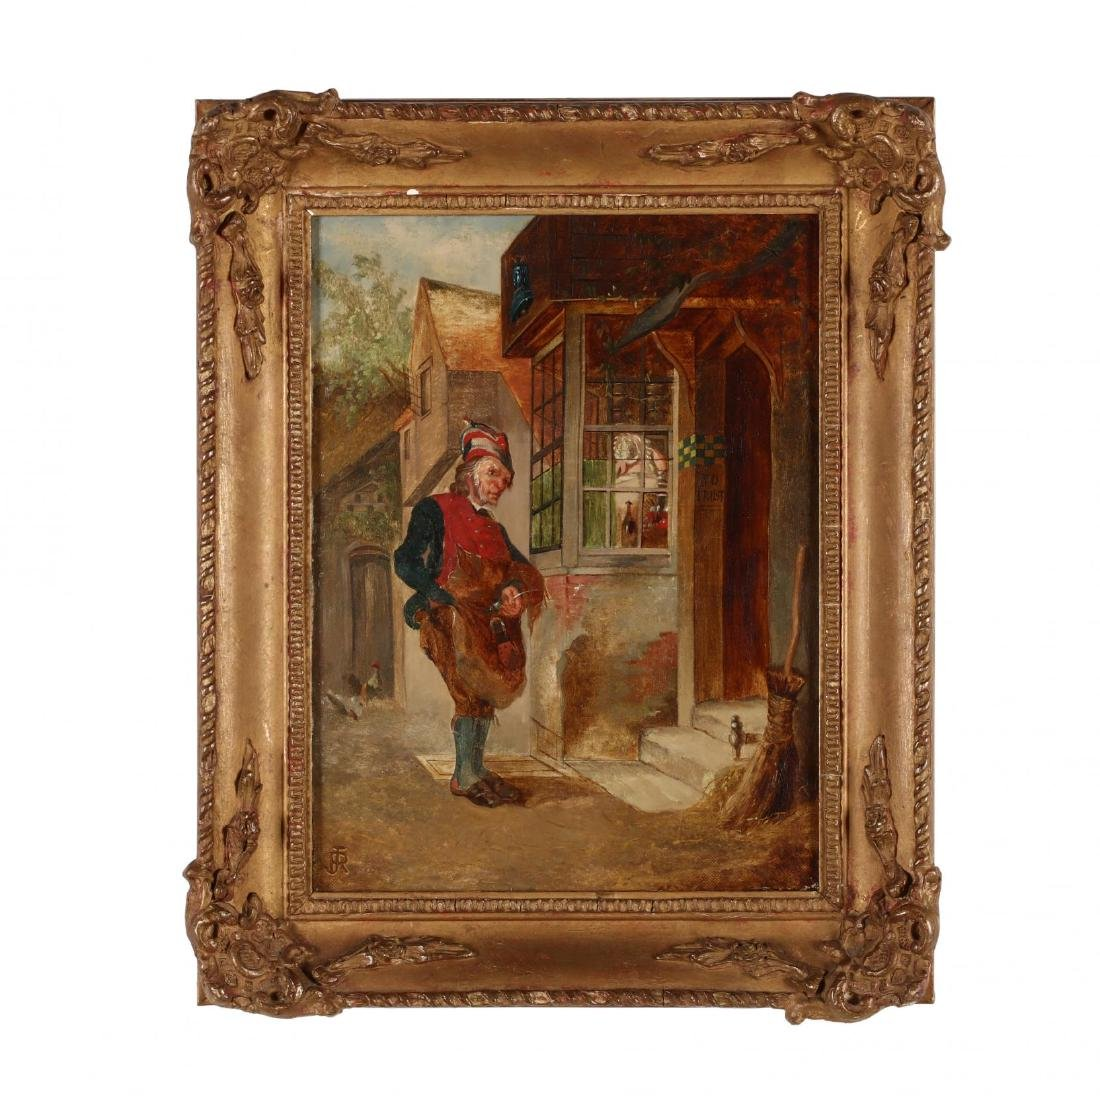 after Rudolf Jordan (German, 1810-1887), The Cobbler